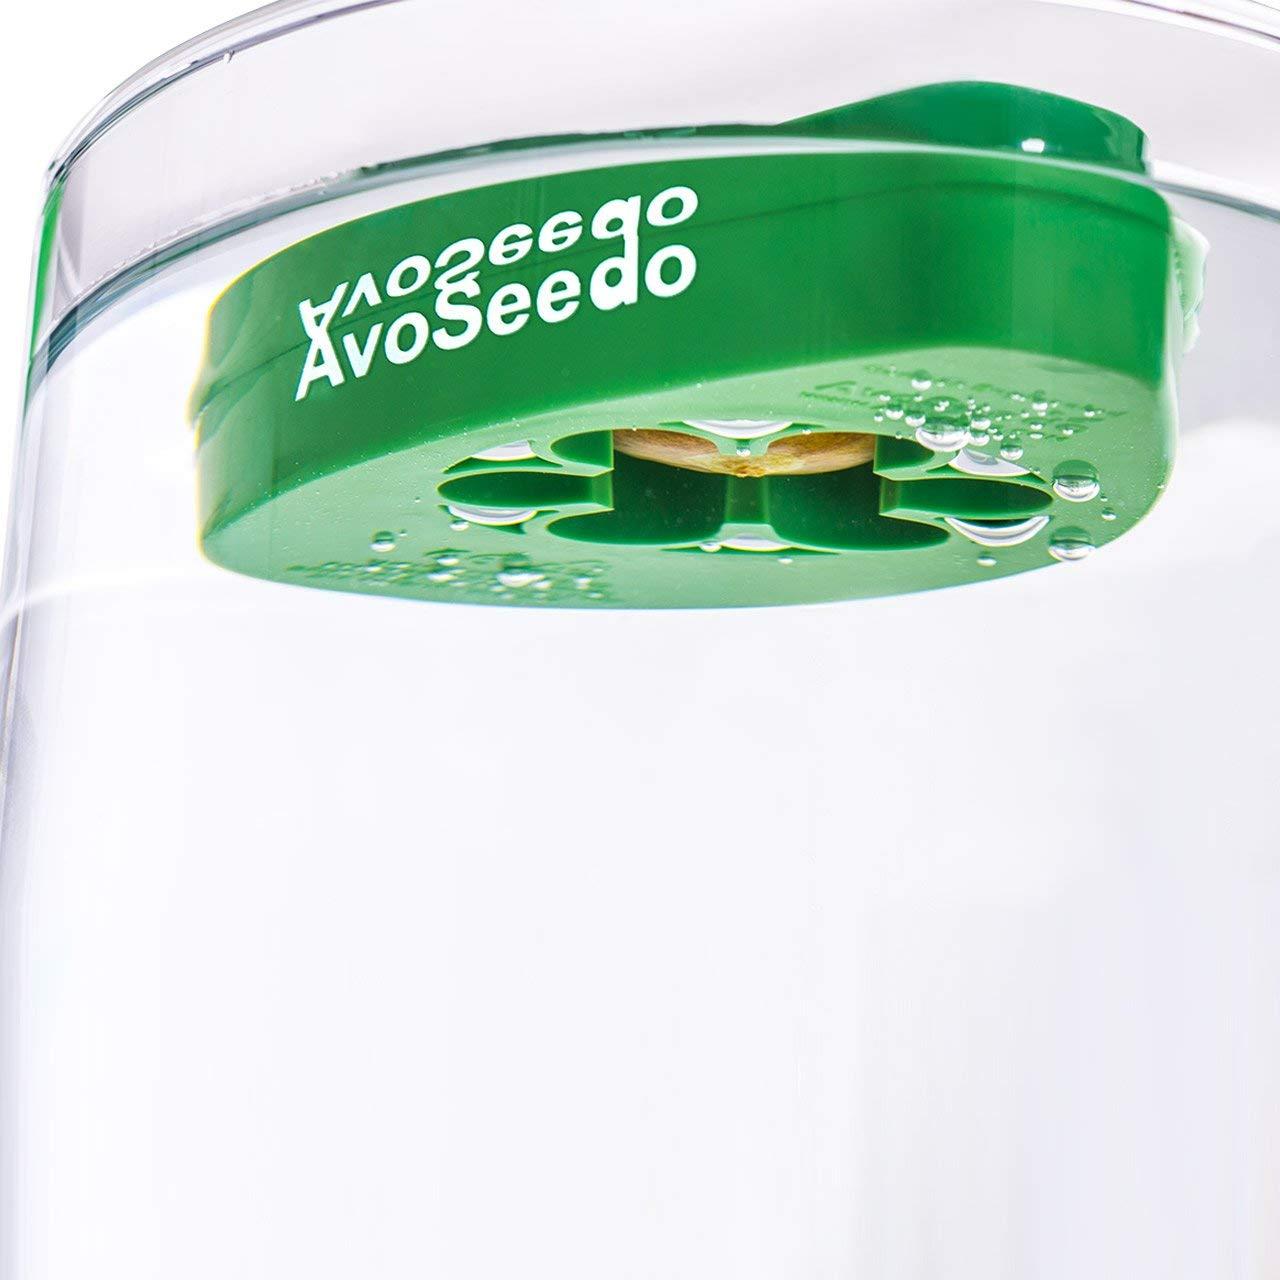 how to grow avocado tree in a bowl kit avoseedo